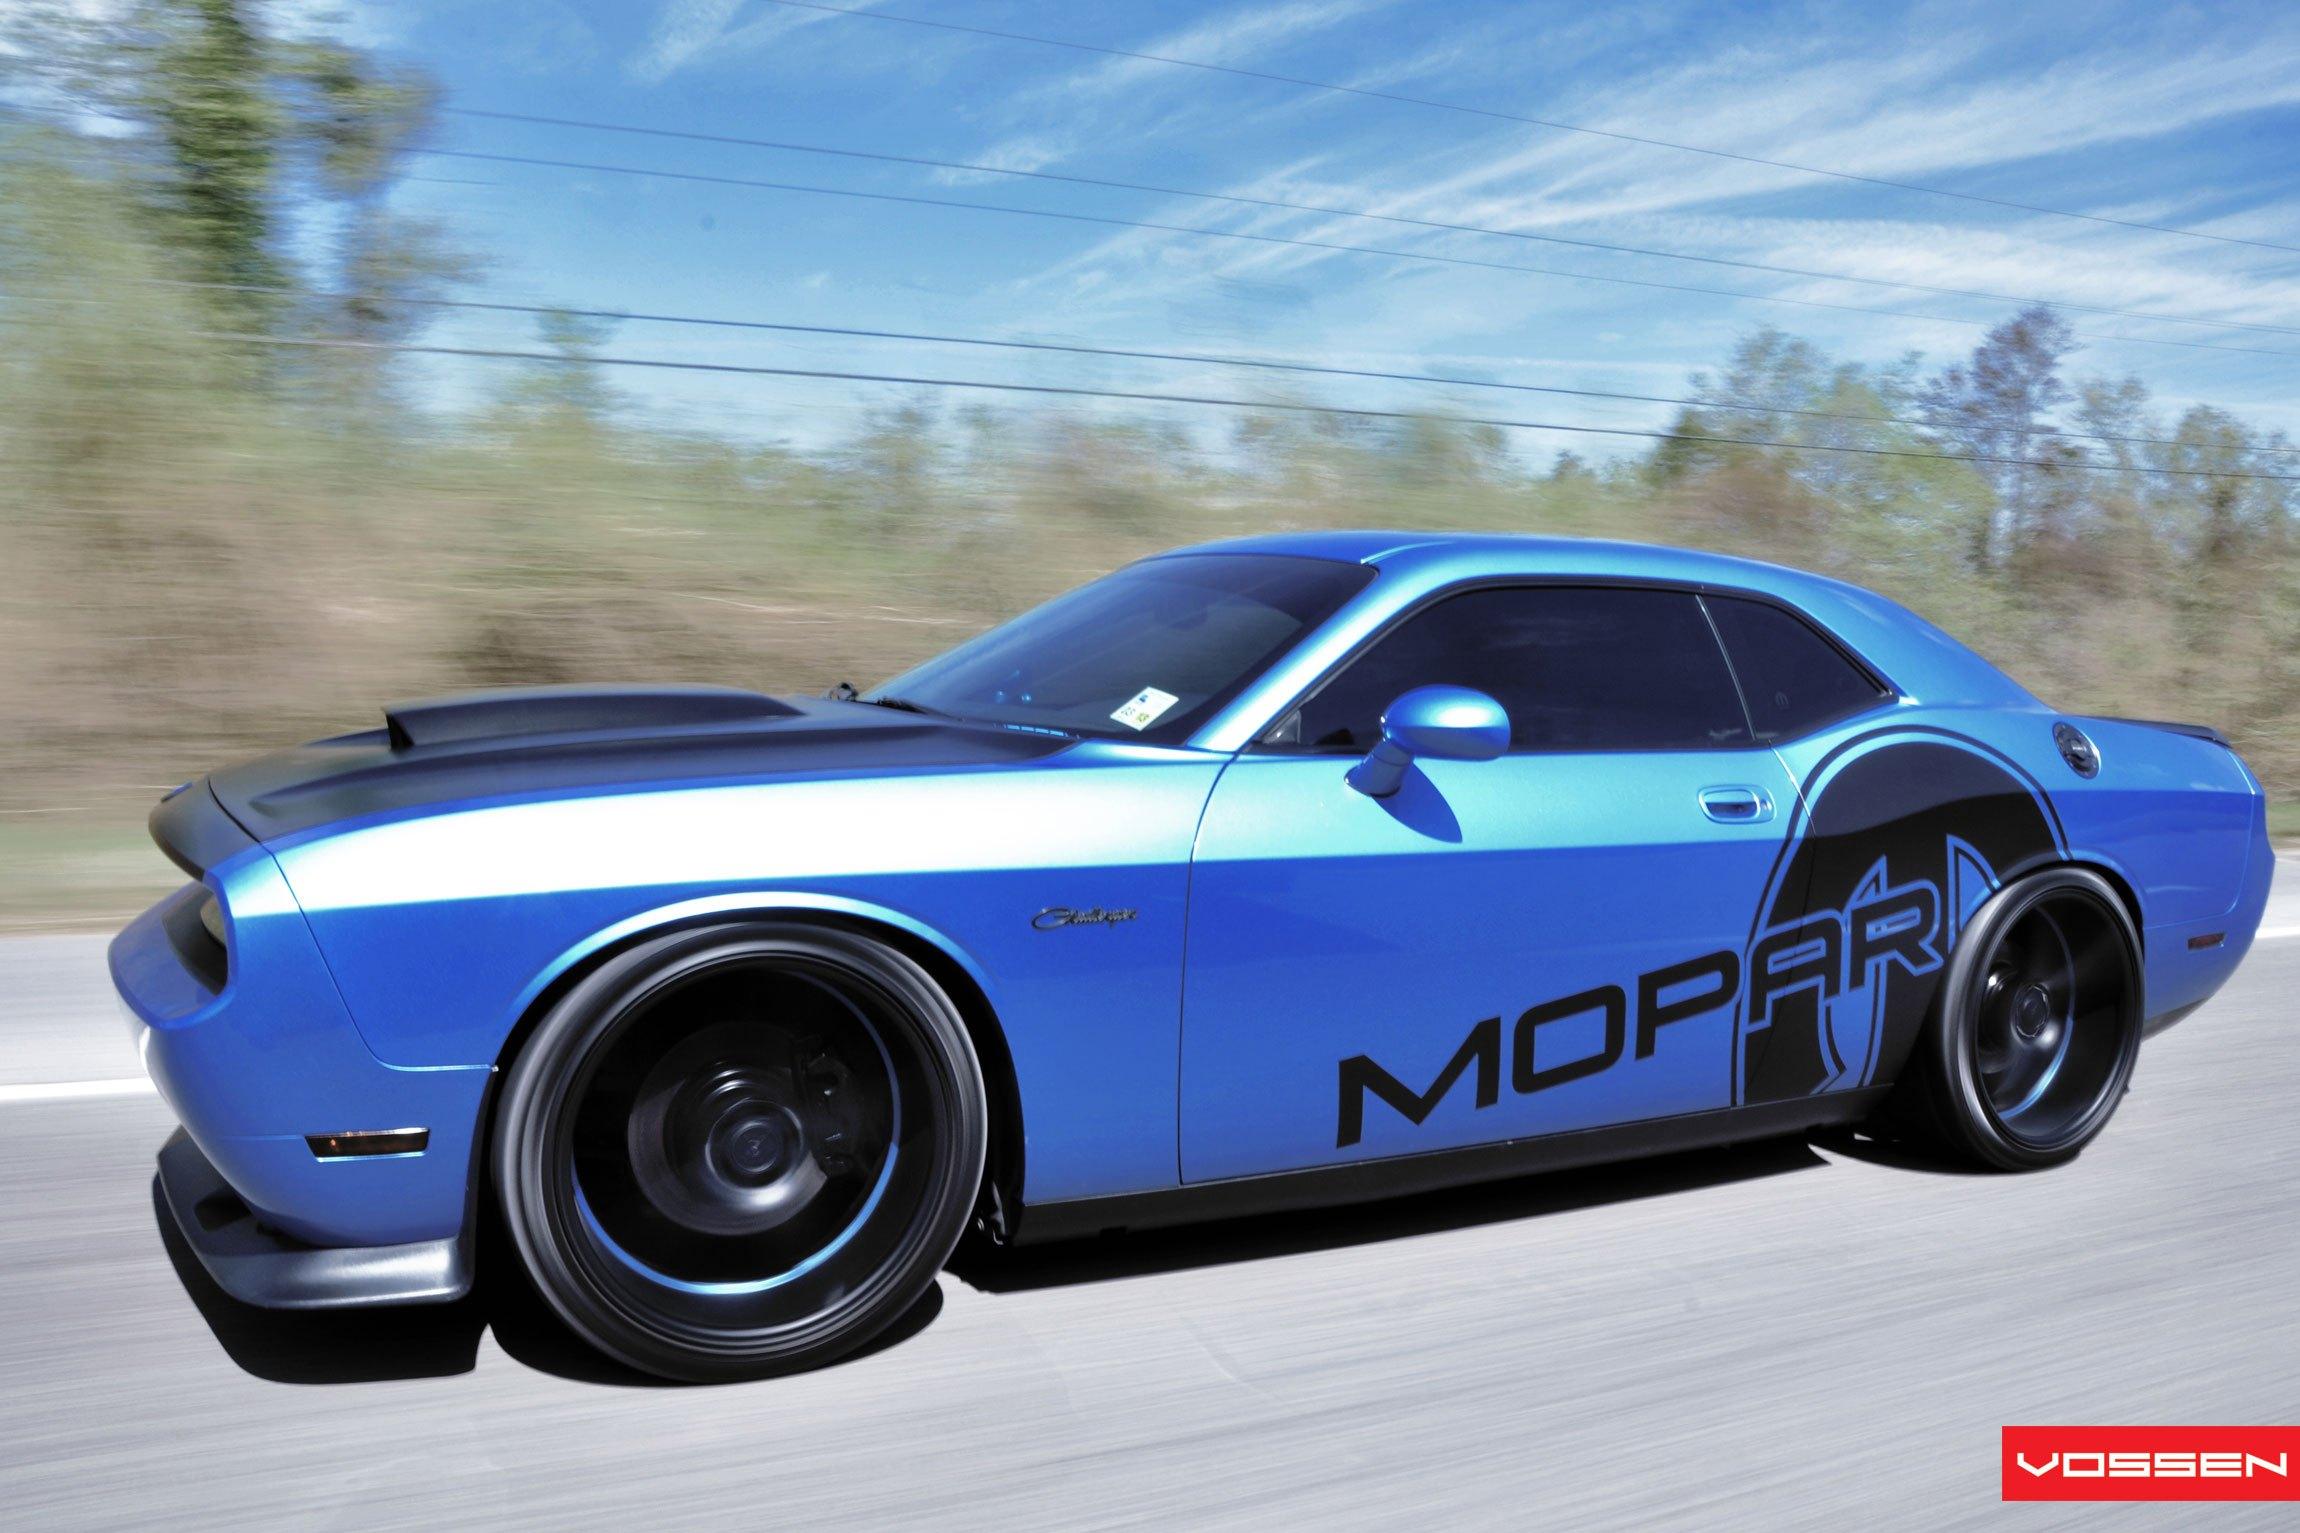 Mopar Or No Car Customized Blue Dodge Challenger Carid Com Gallery